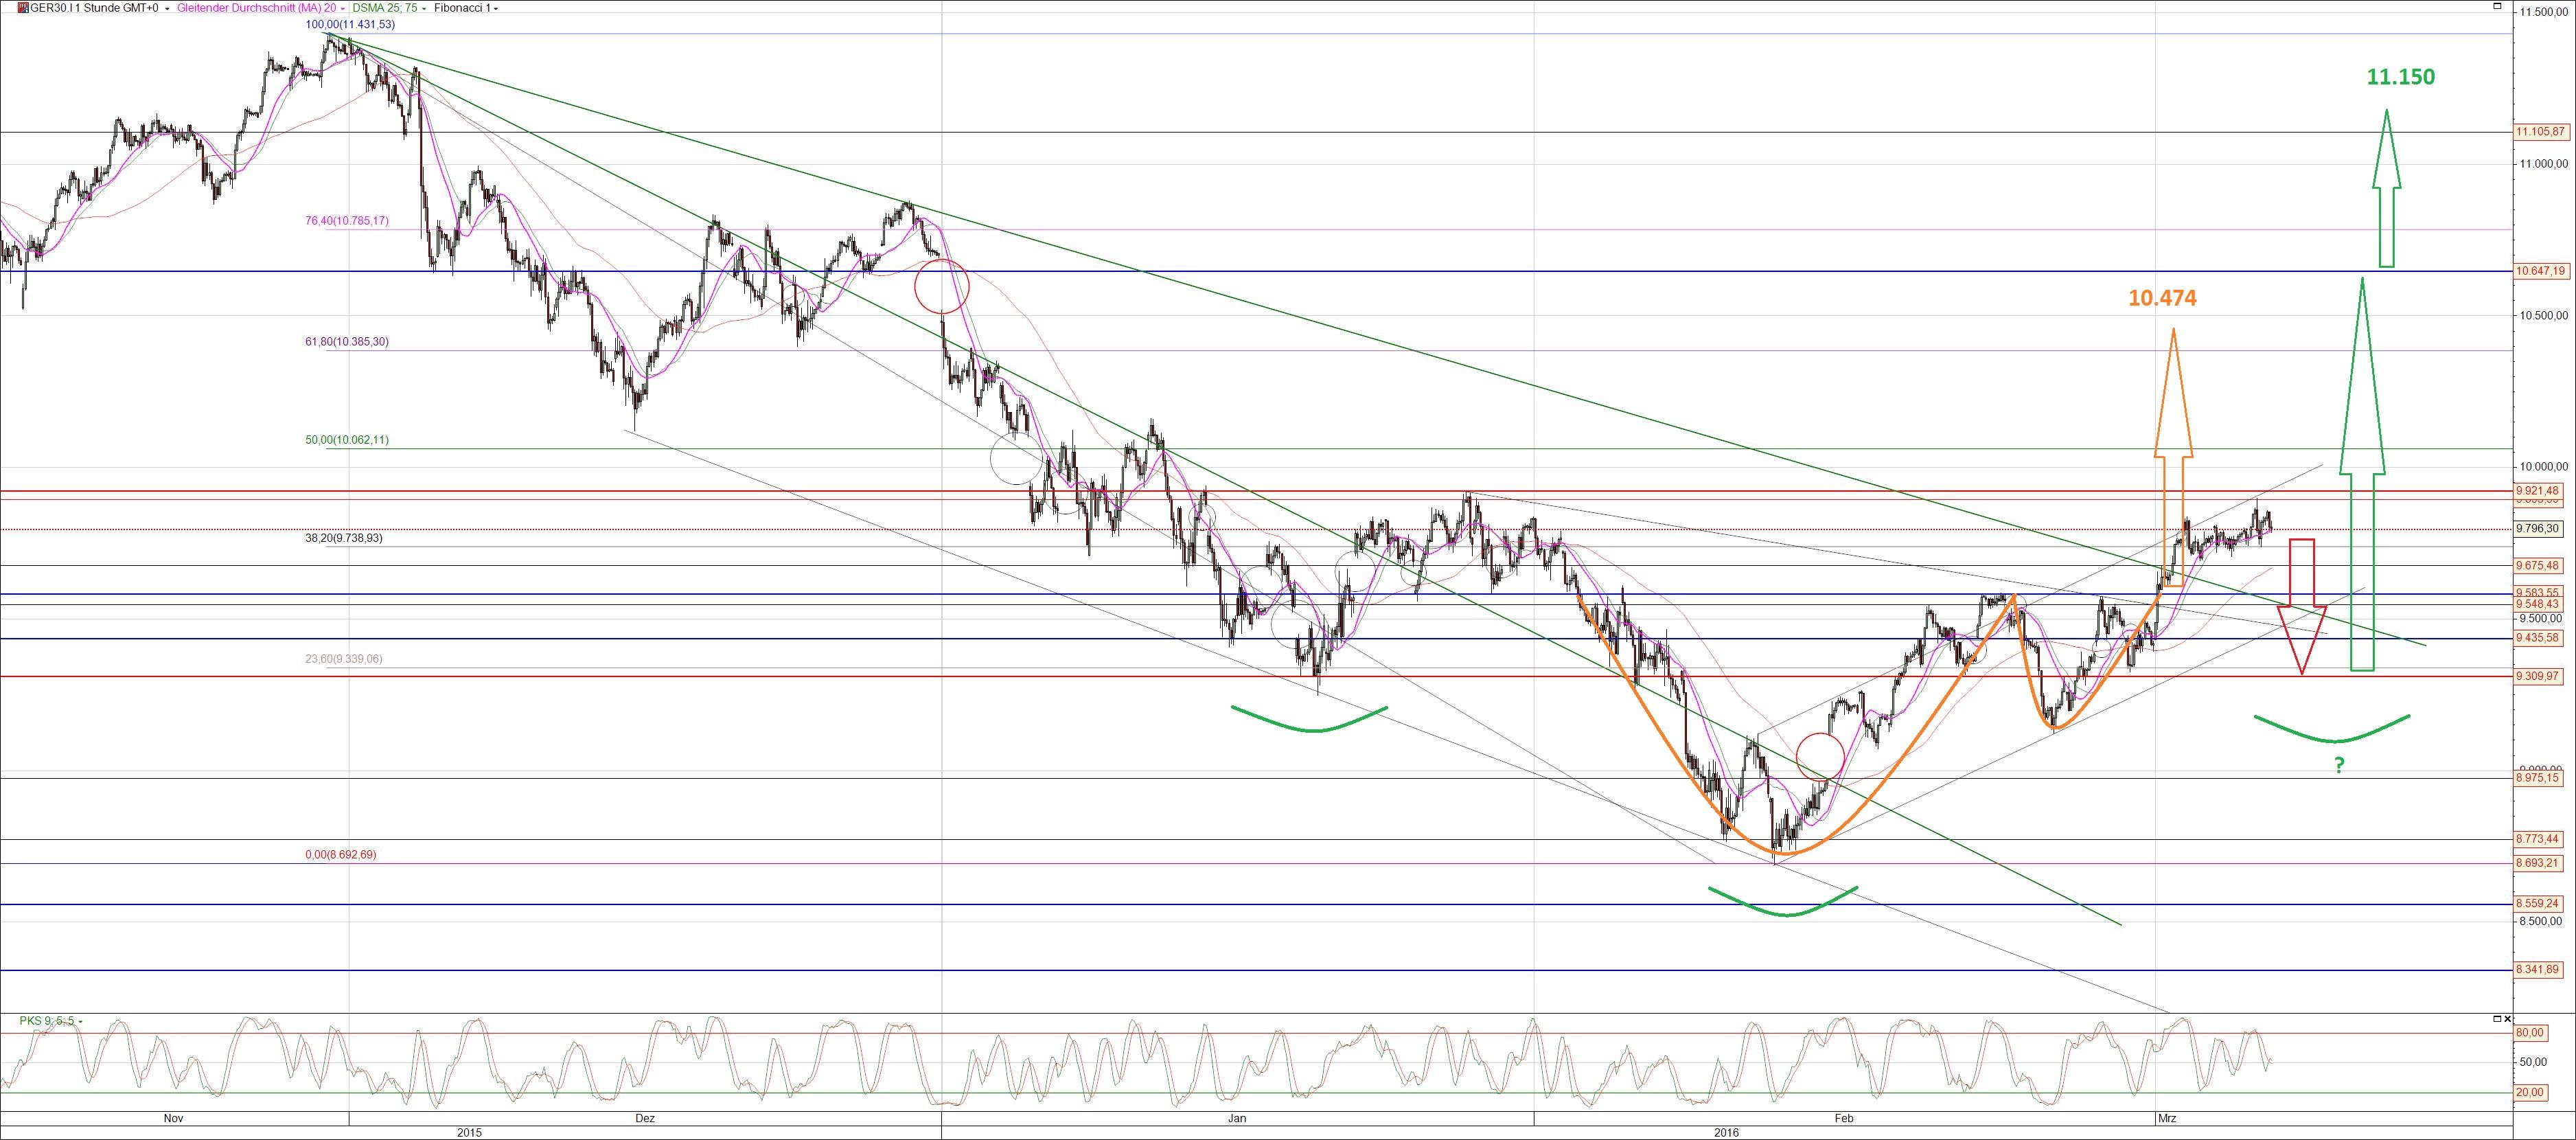 Dax Chart Analyse kurzfristig